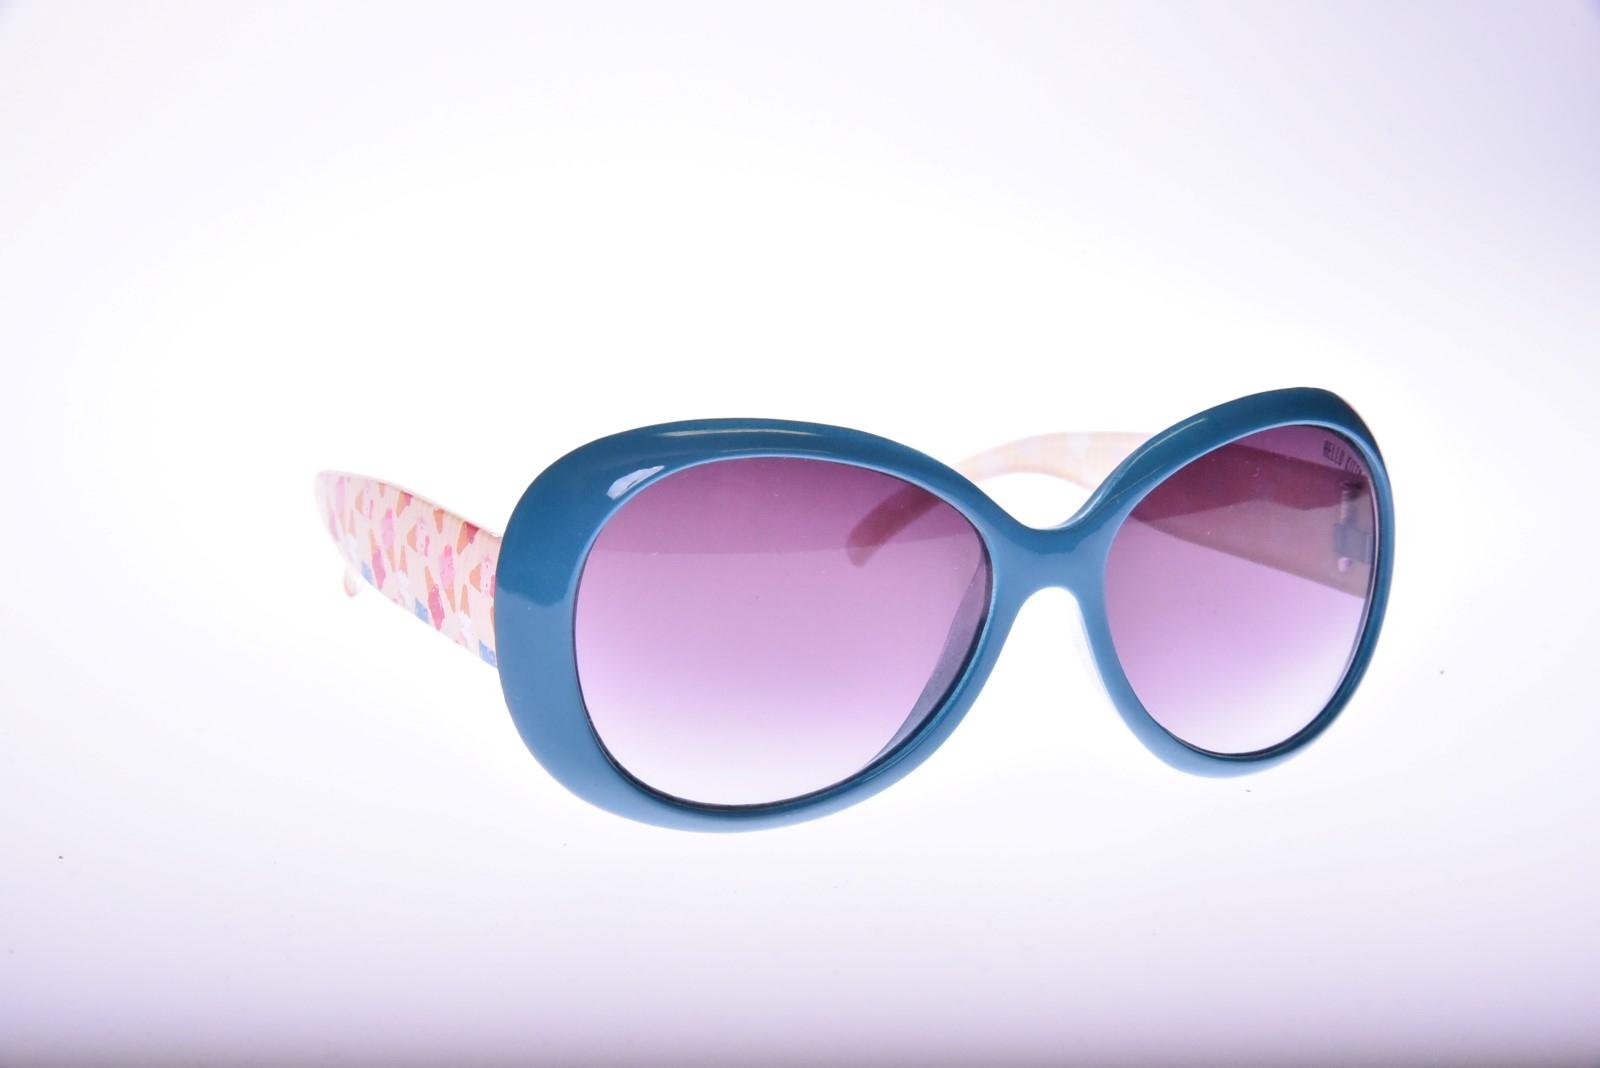 Polaroid Hello Kitty K6303B - Slnečné okuliare pre deti 8-12 r.